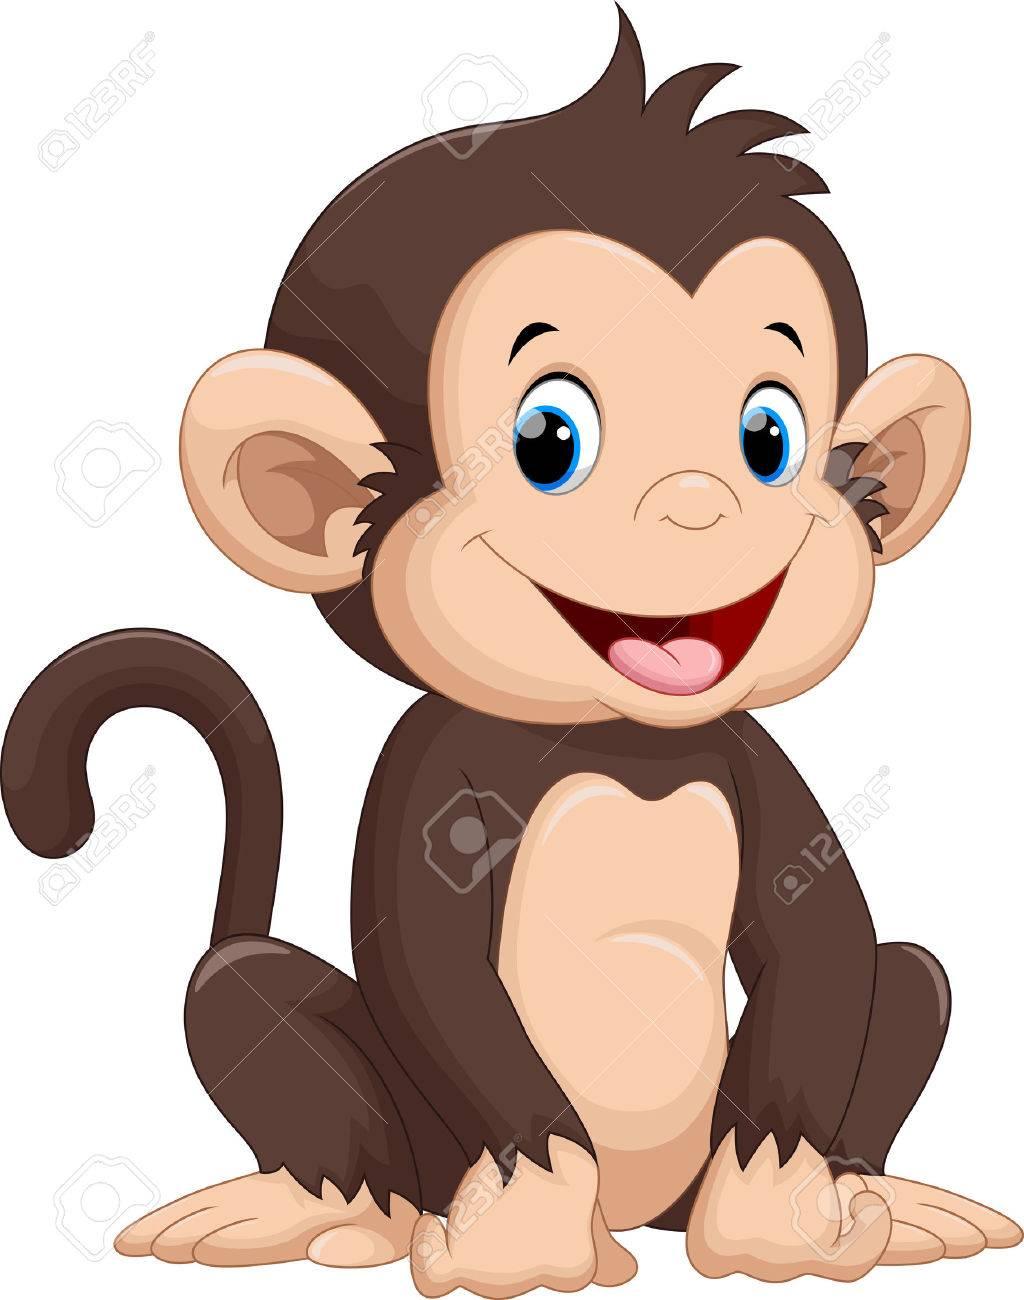 Cute monkey cartoon - 50993717